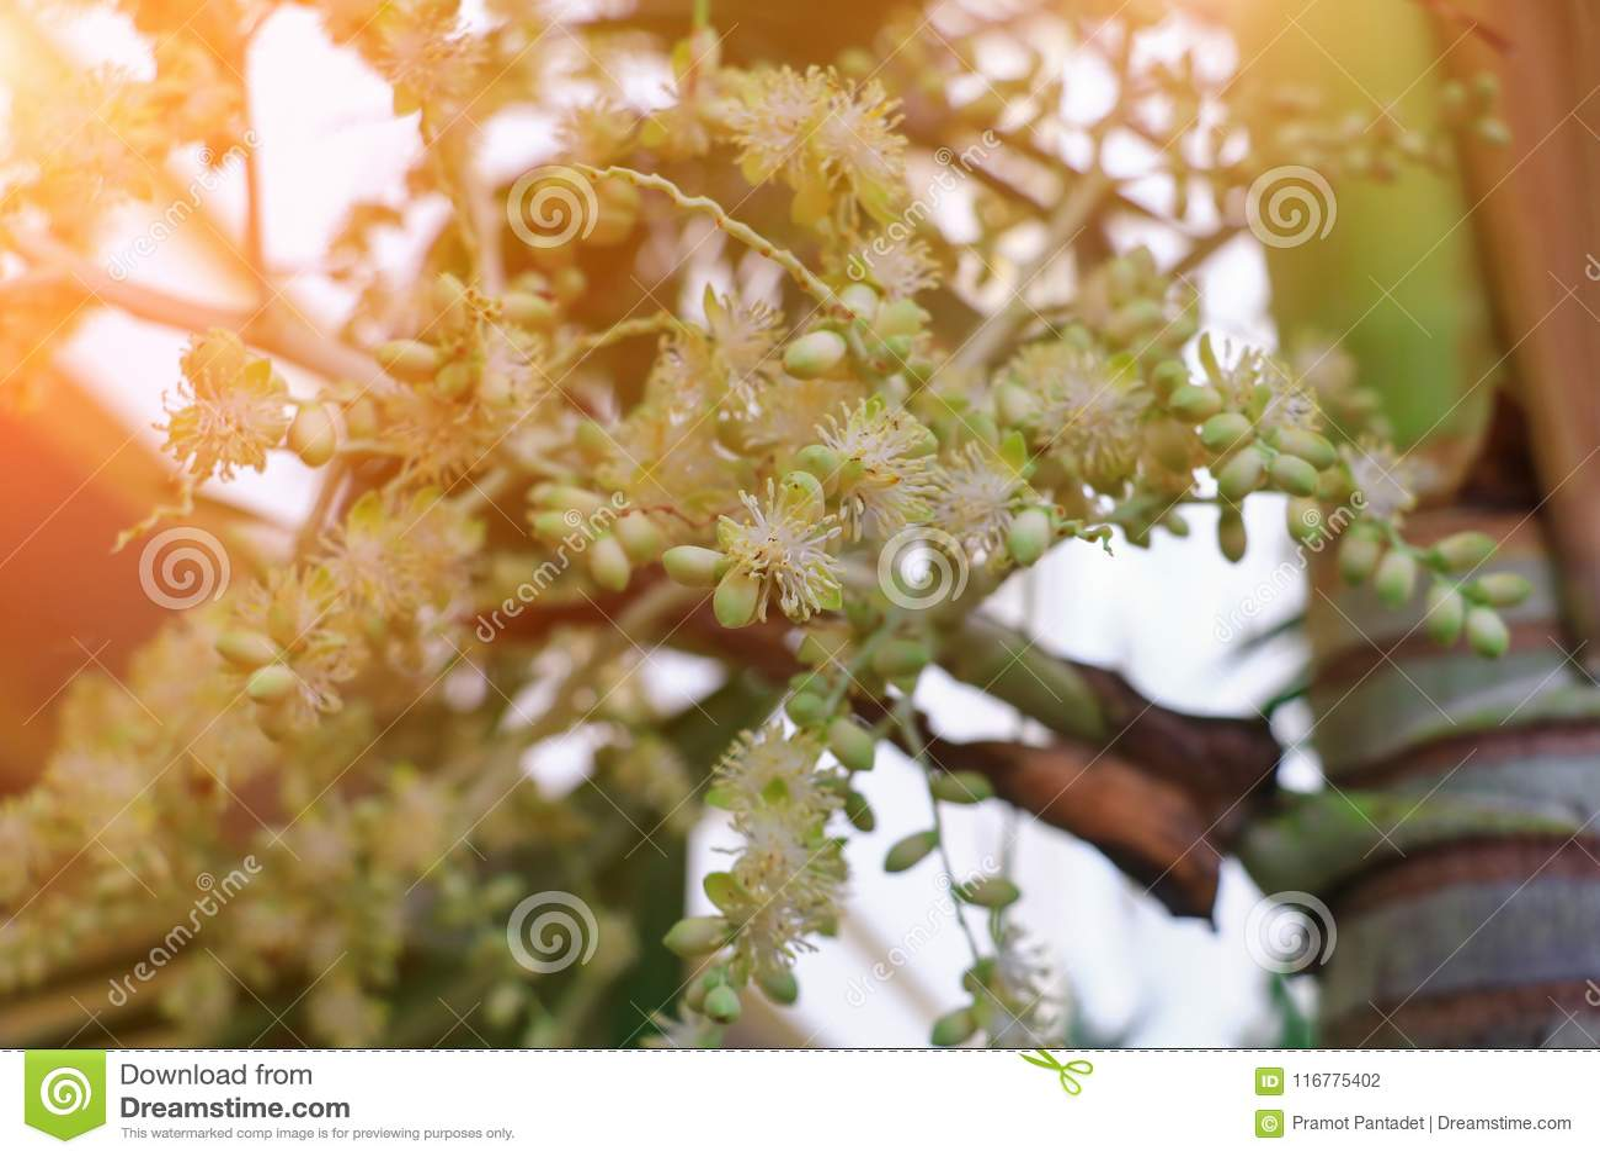 Flower Raja Lipstick Palm Sealing wax , Lipstick , Raja , Maharajah ornamental plant in garden with light sunrise tone. select